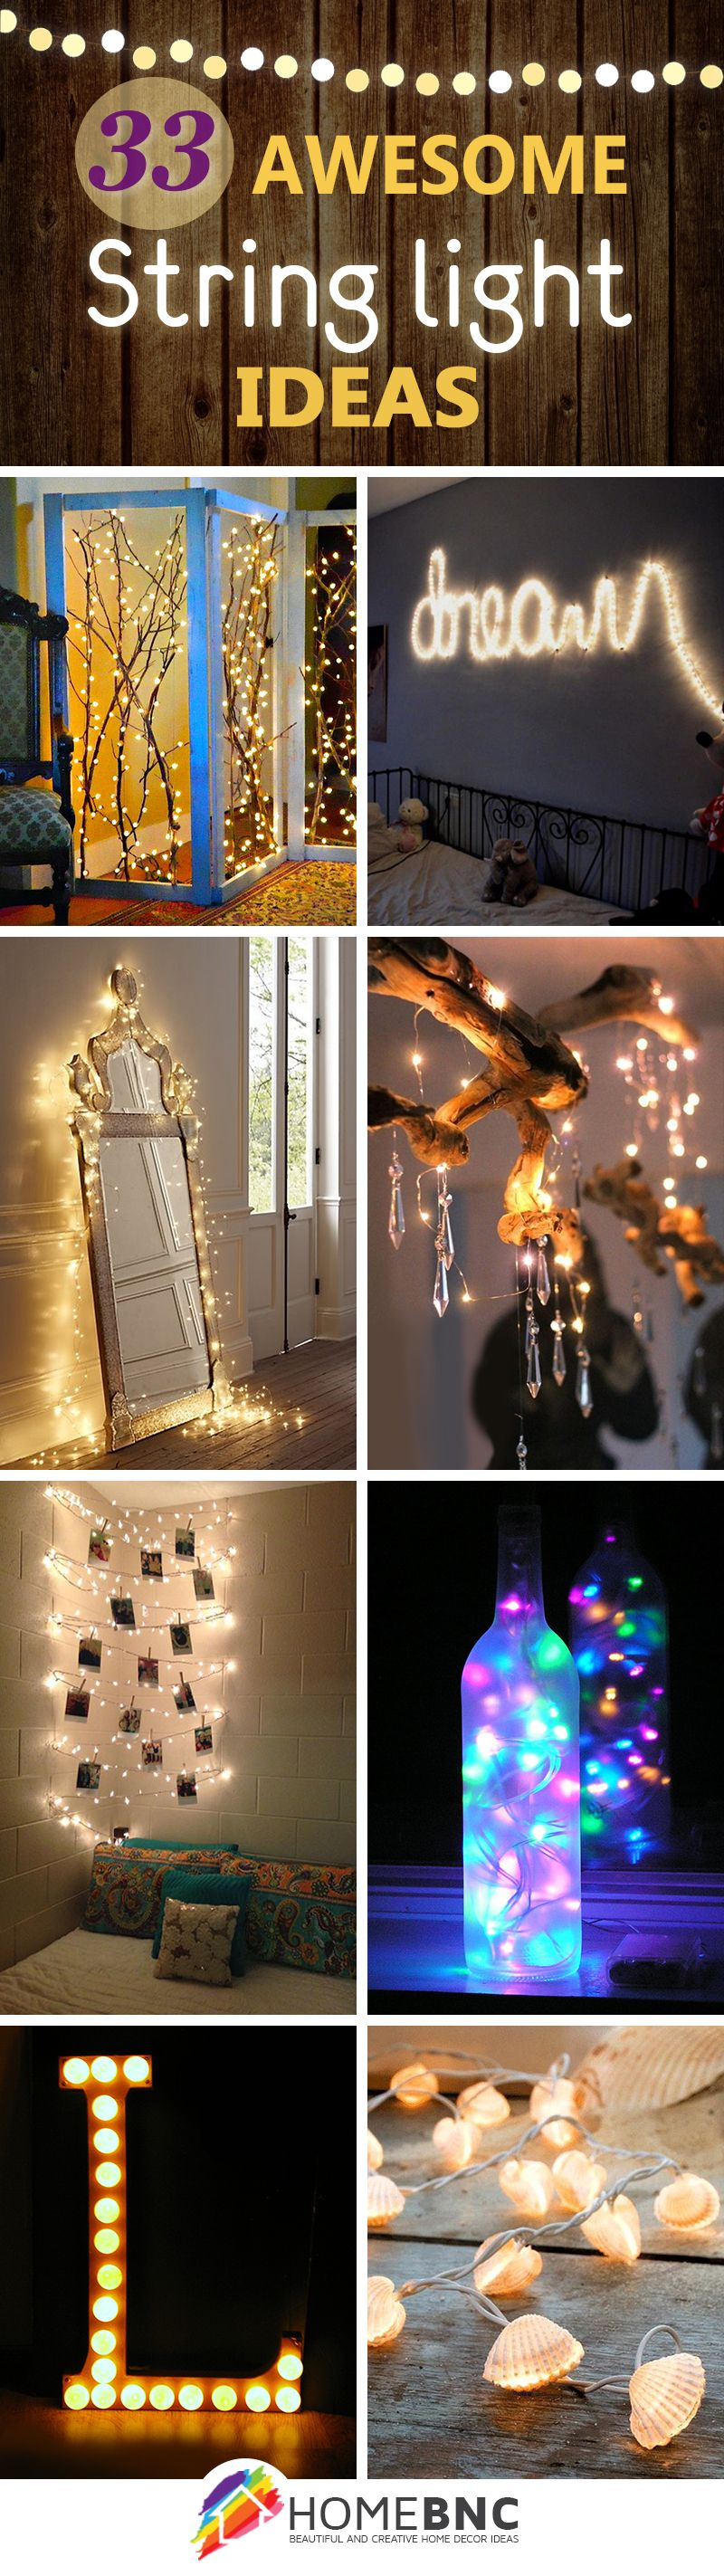 String Lights Decorations 33 Ways to Light